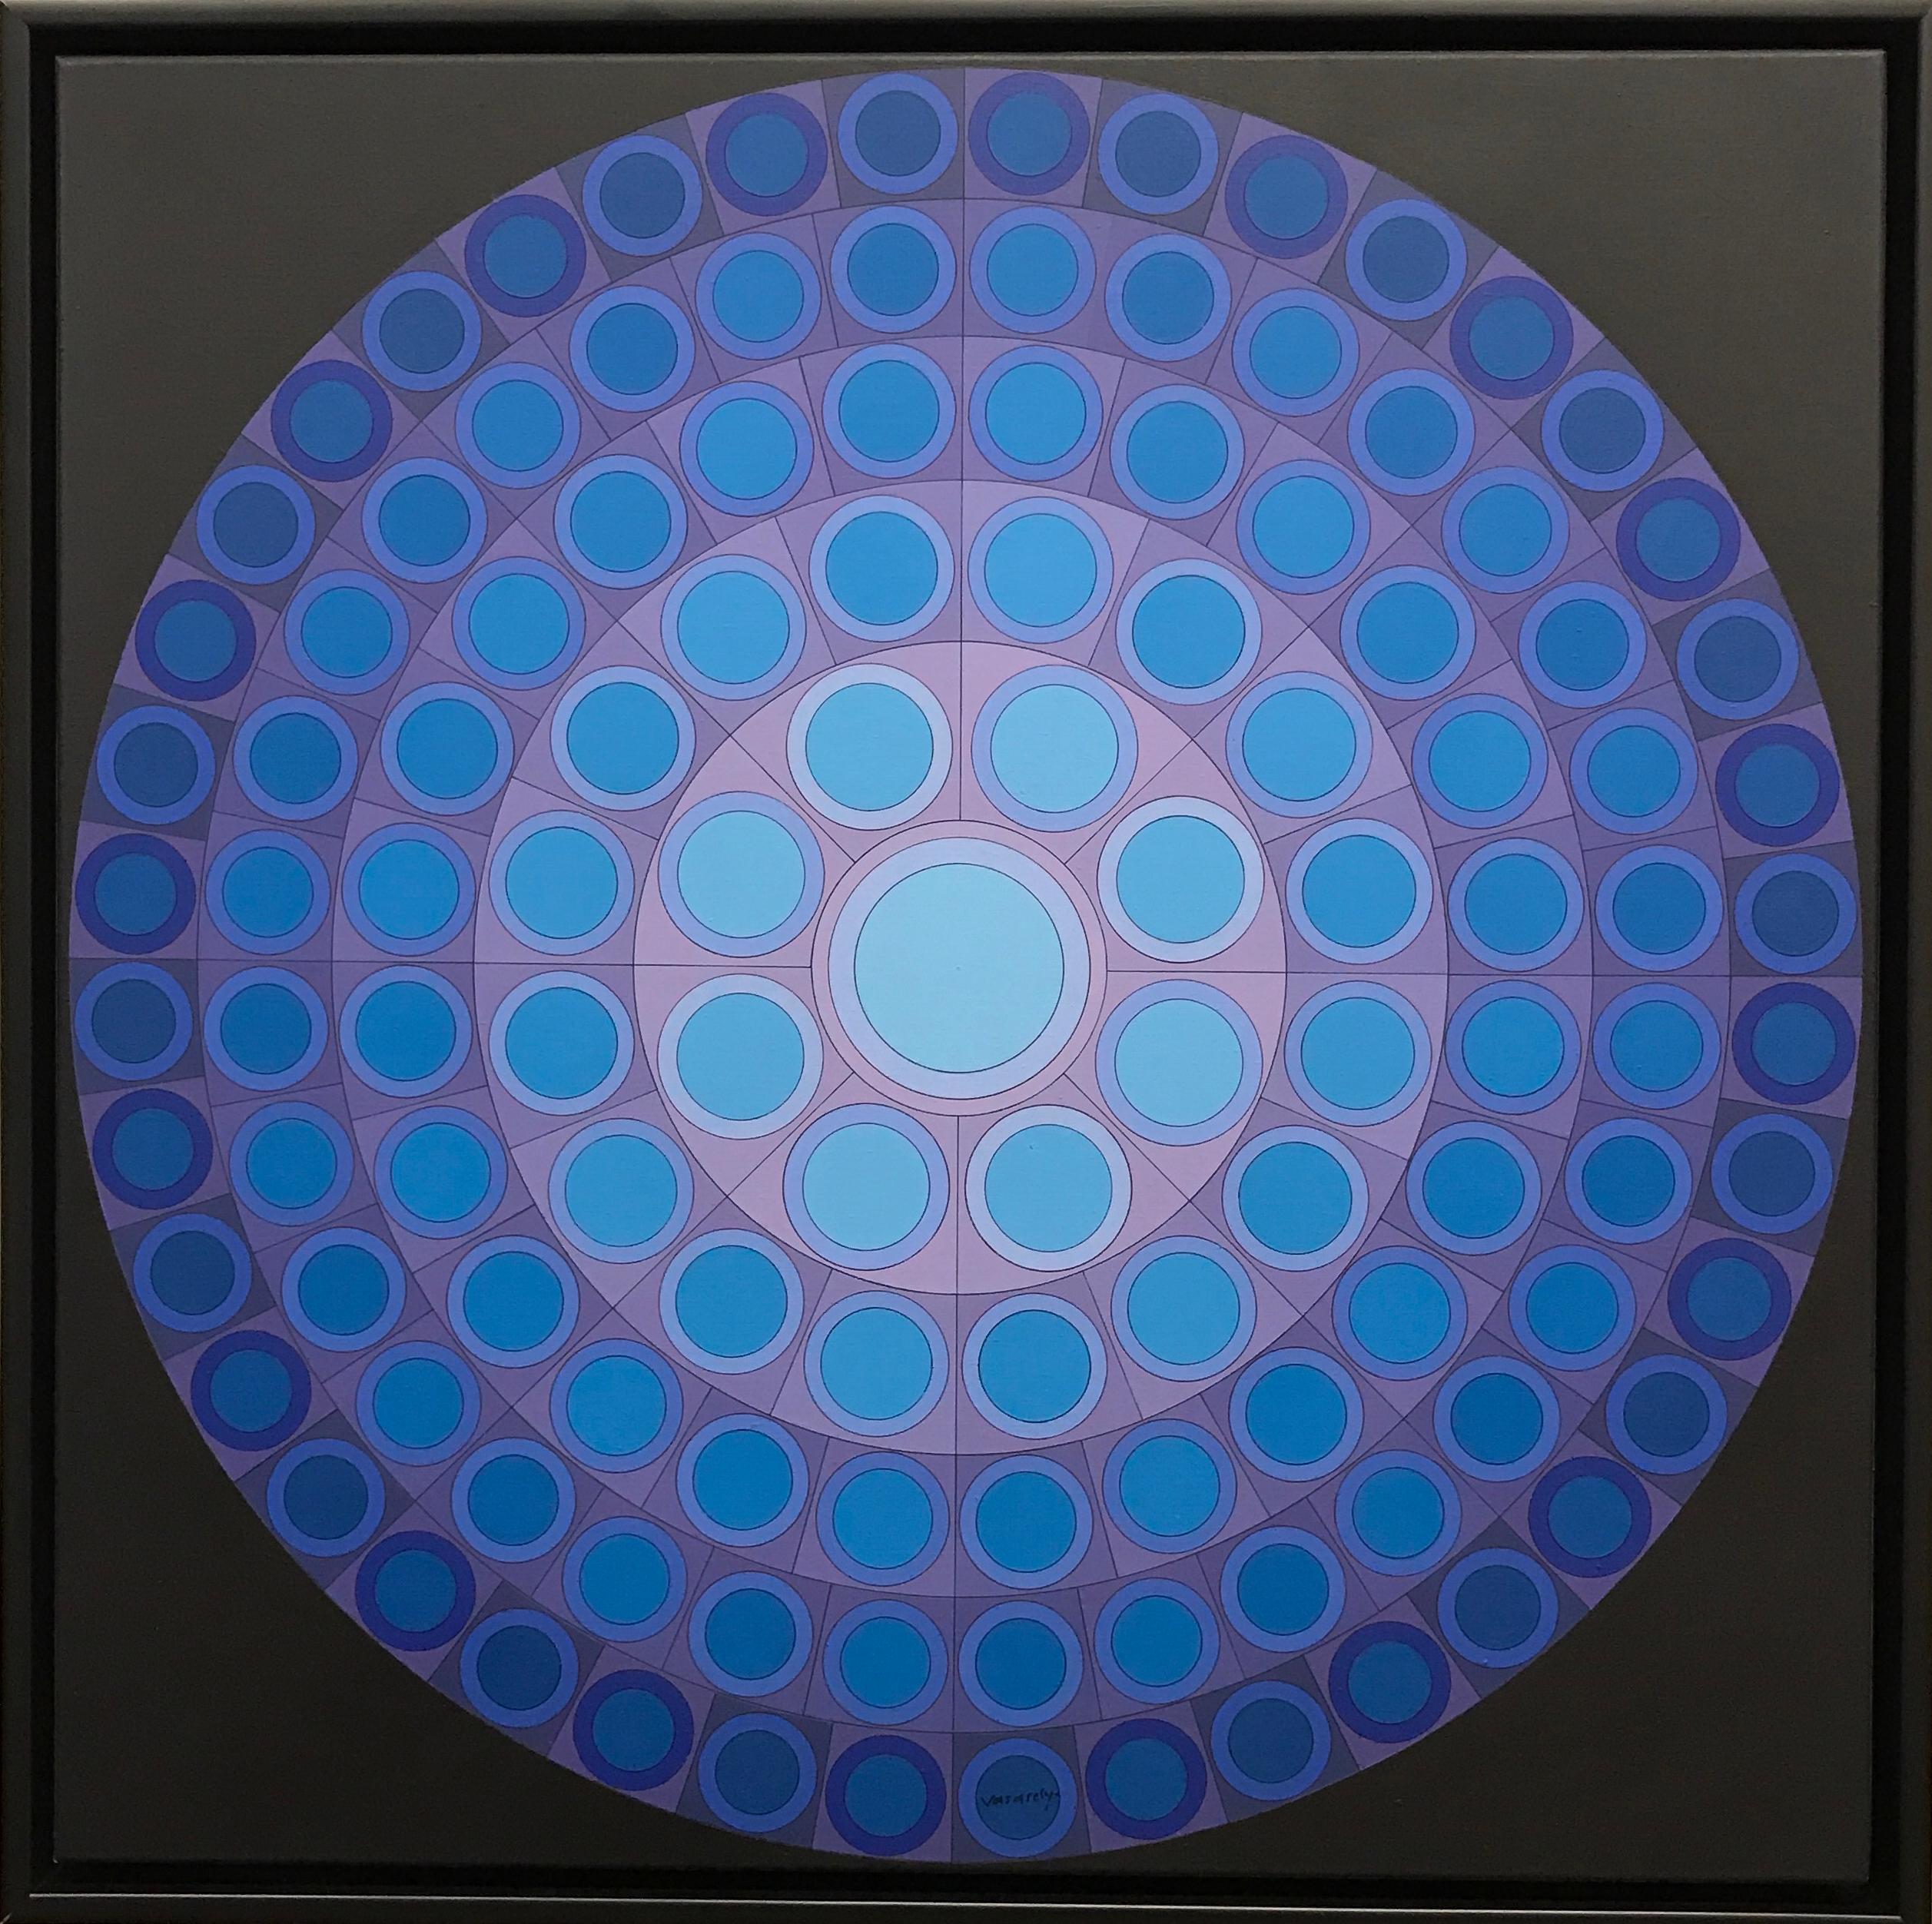 Victor Vasarely, Koer, Acrylic on canvas, 1974